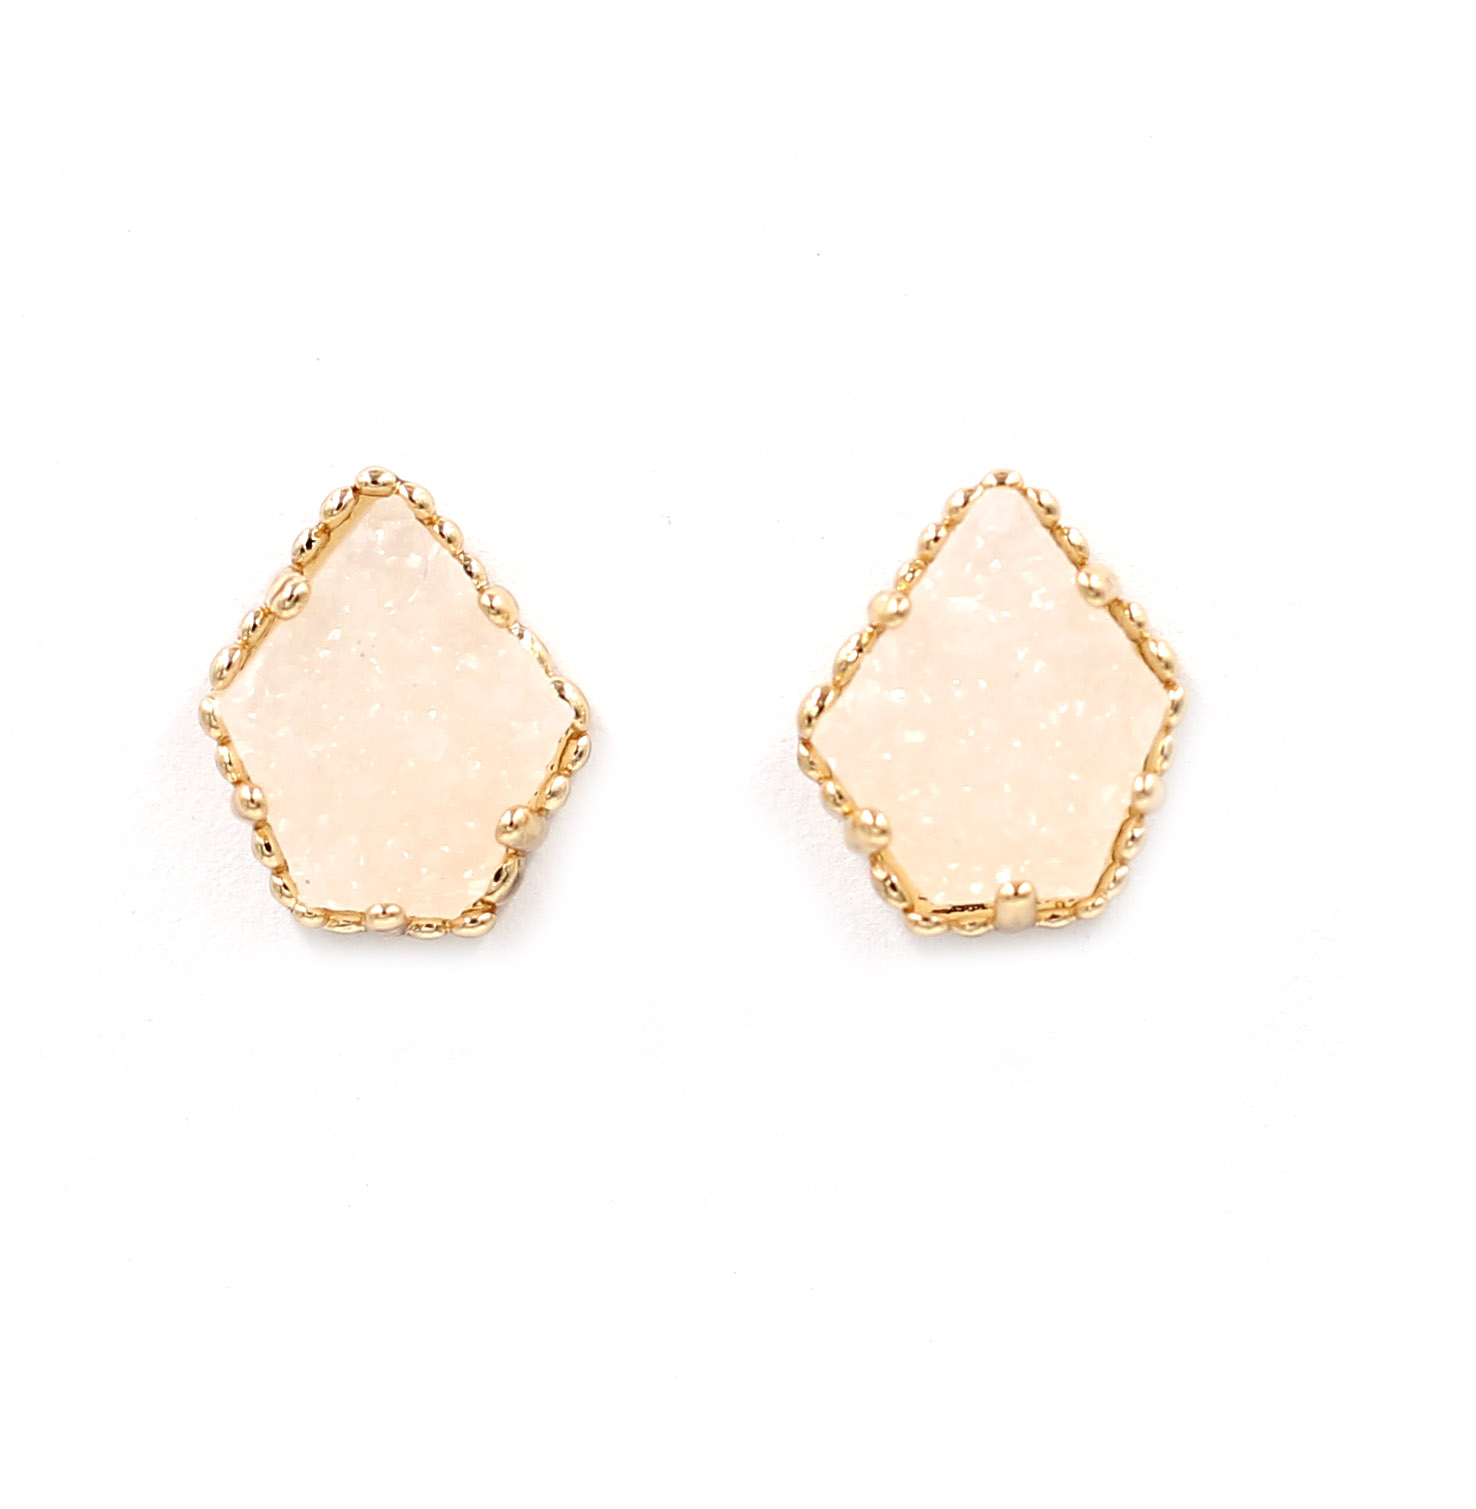 New Off White Resin Druzy Geometric Stud Earrings